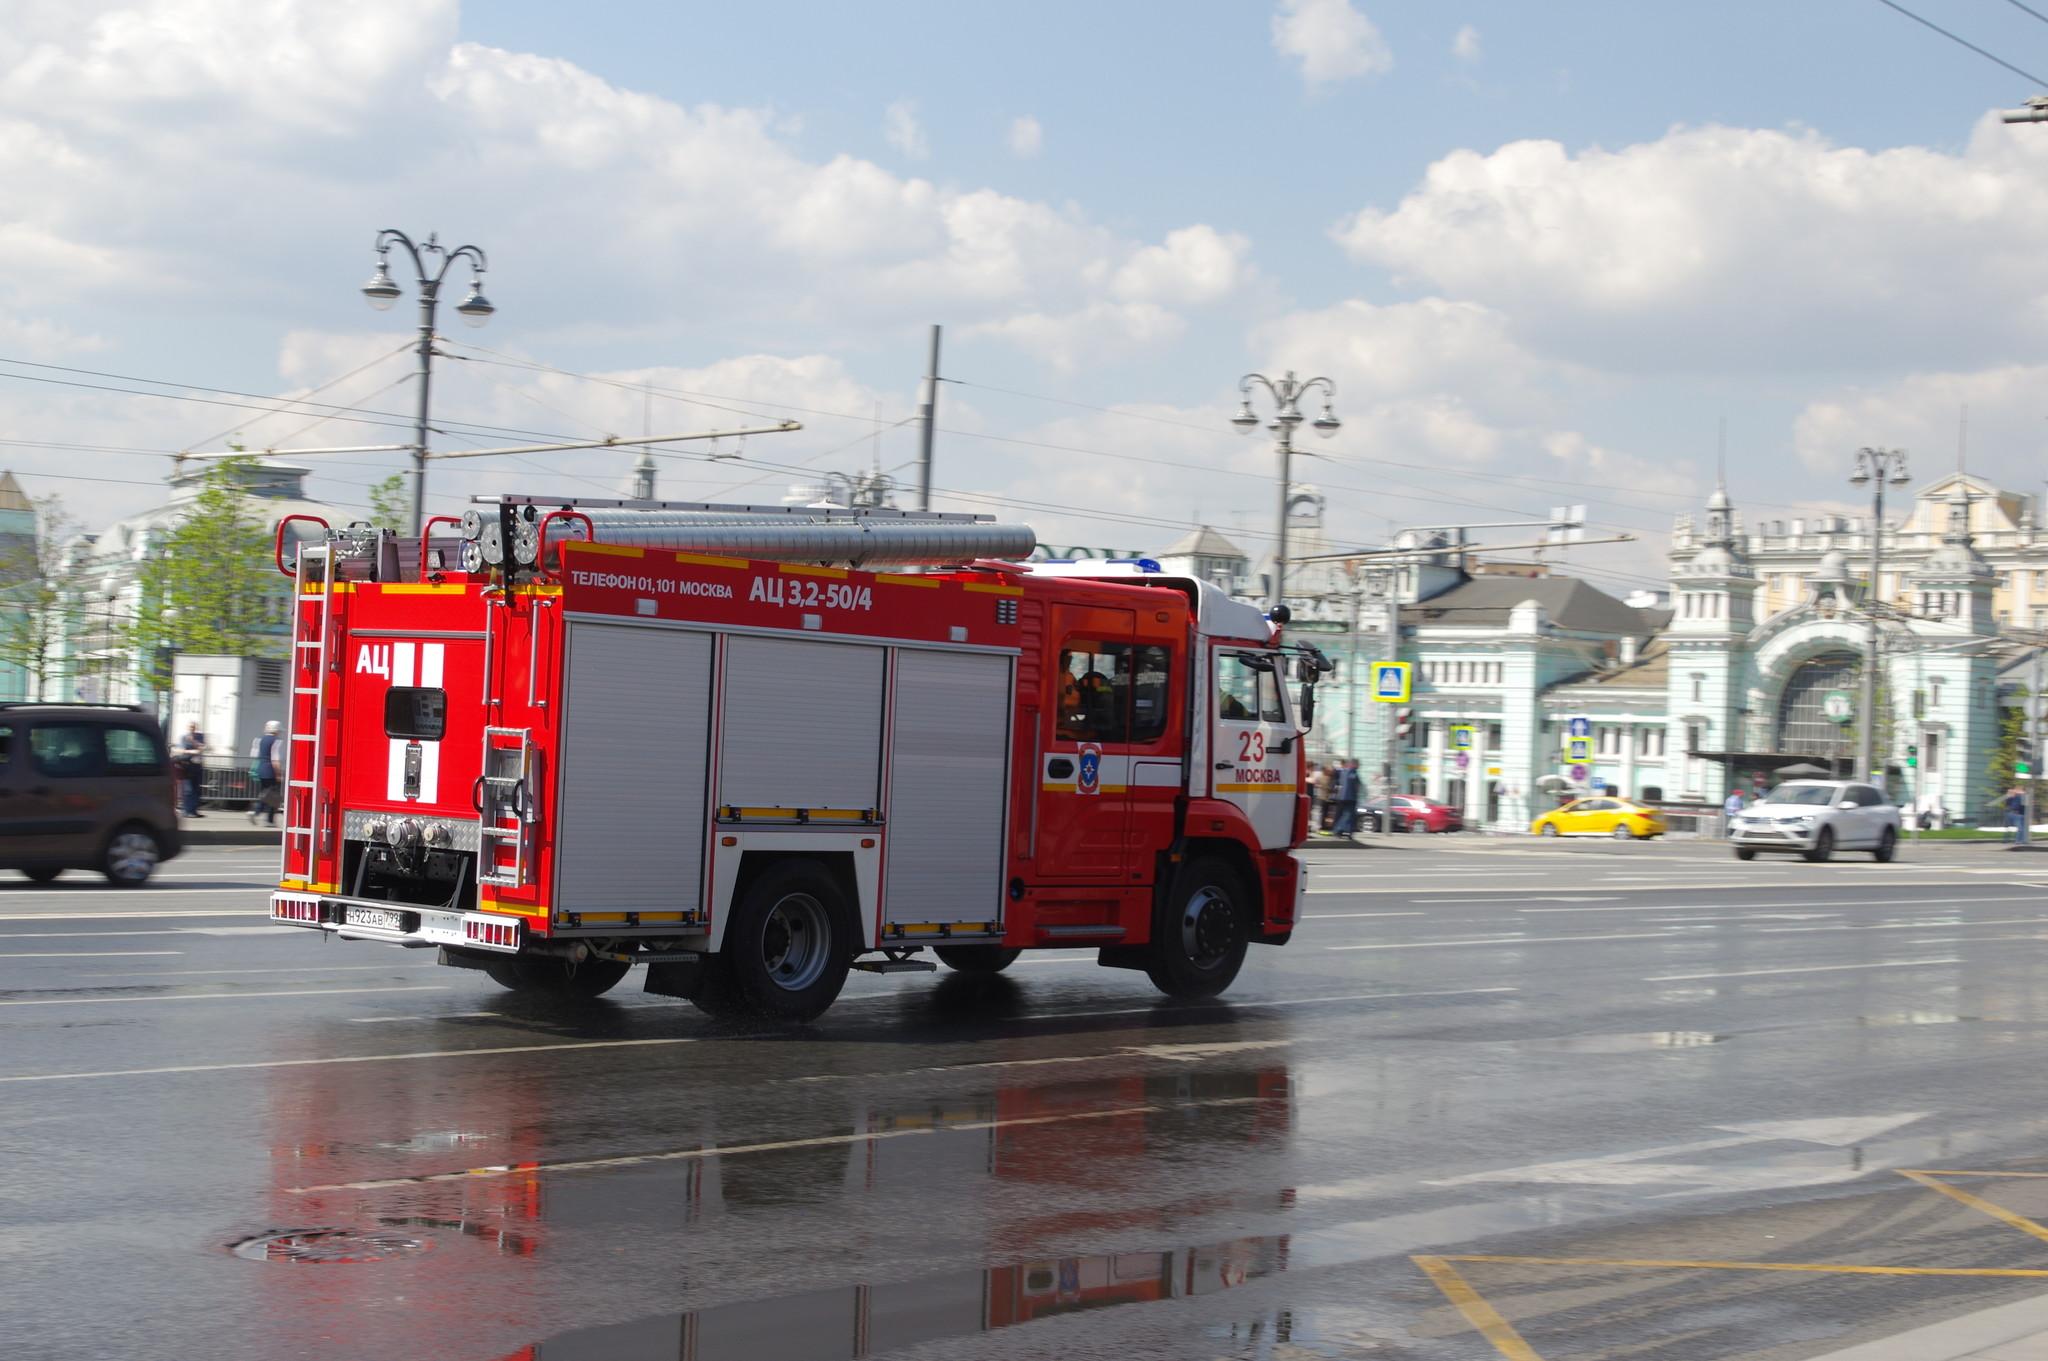 Пожарная автоцистерна АЦ-3,2-50/4